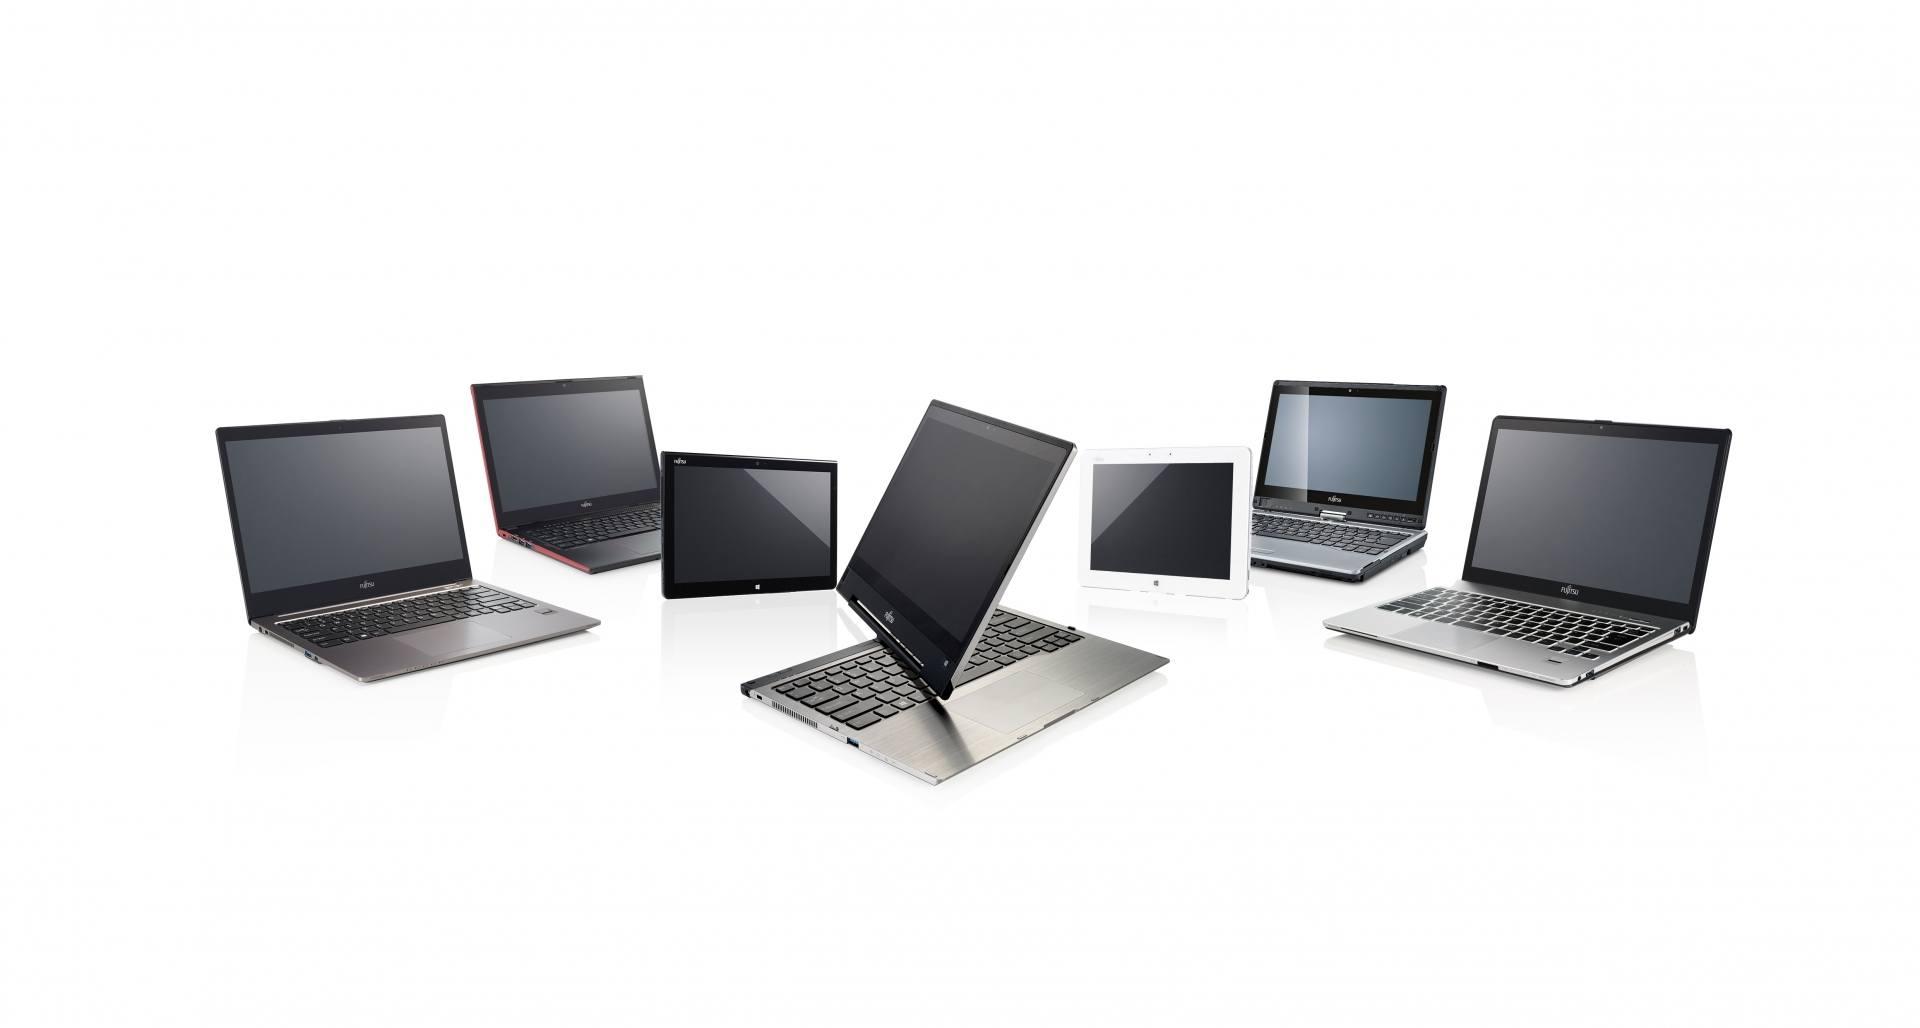 Fujitsu_Lifebook_Family_Amilo_Lifebook_Ultrabook